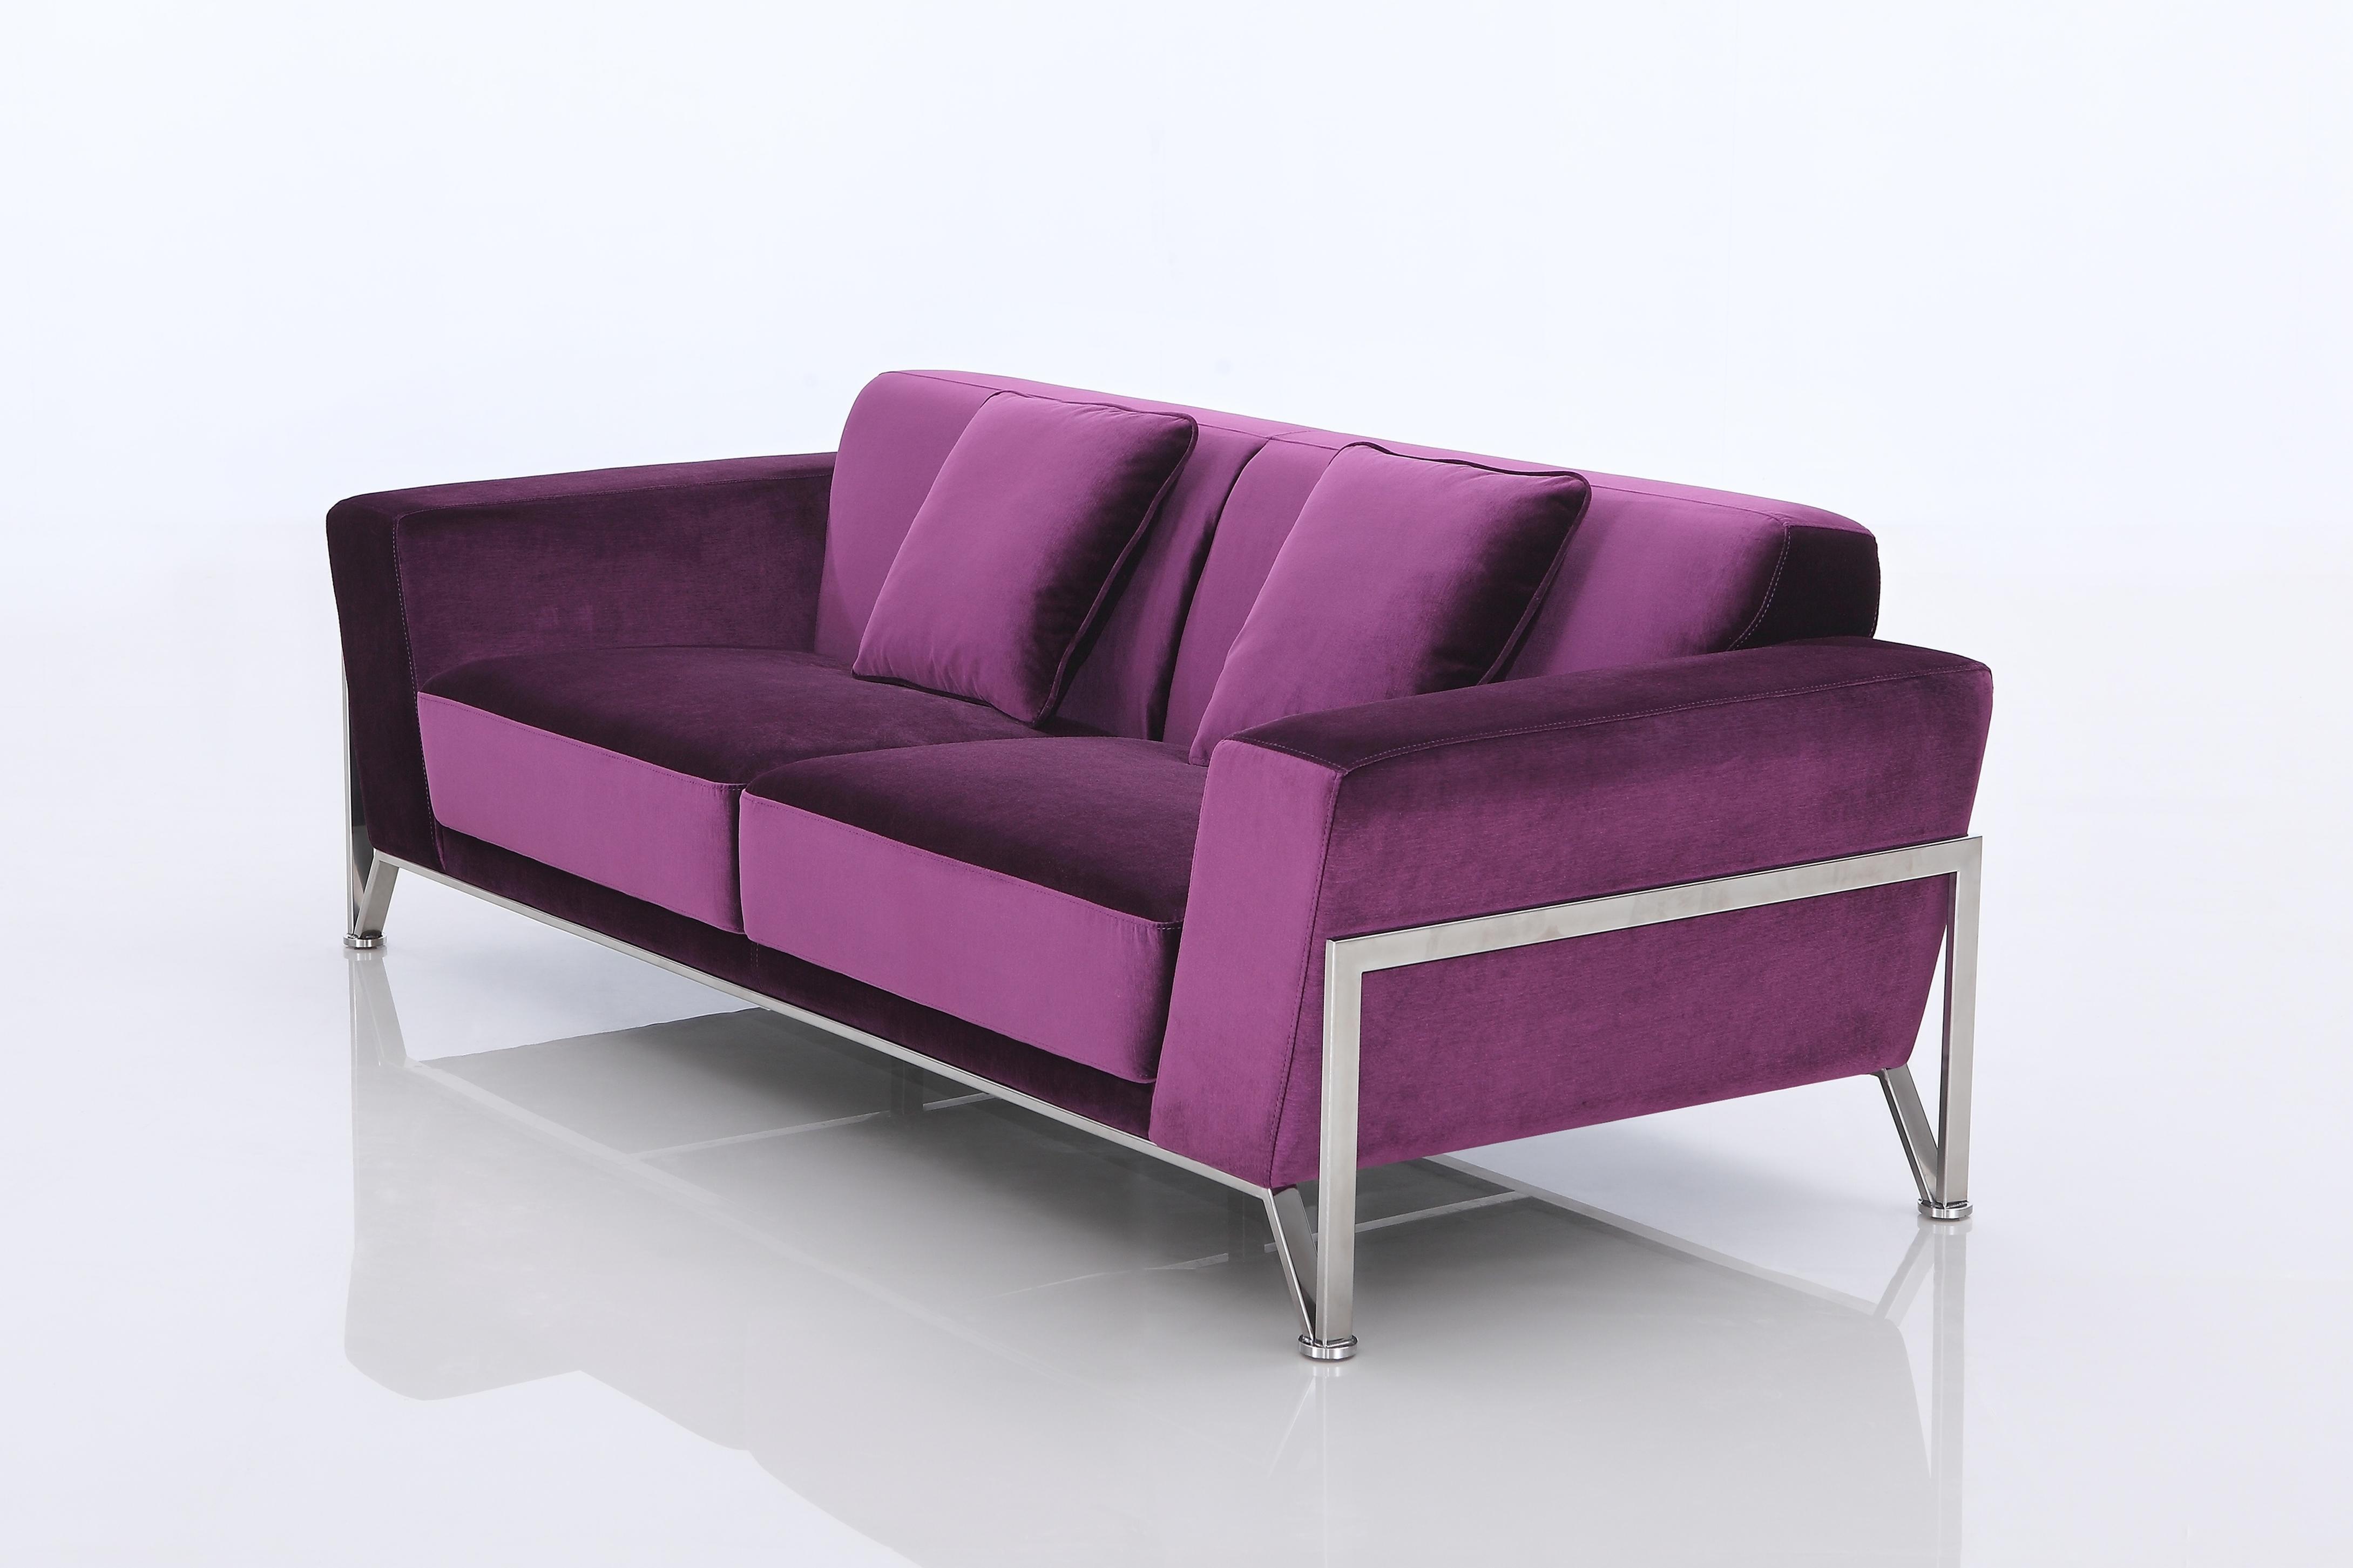 Rouche Fabric Sofa